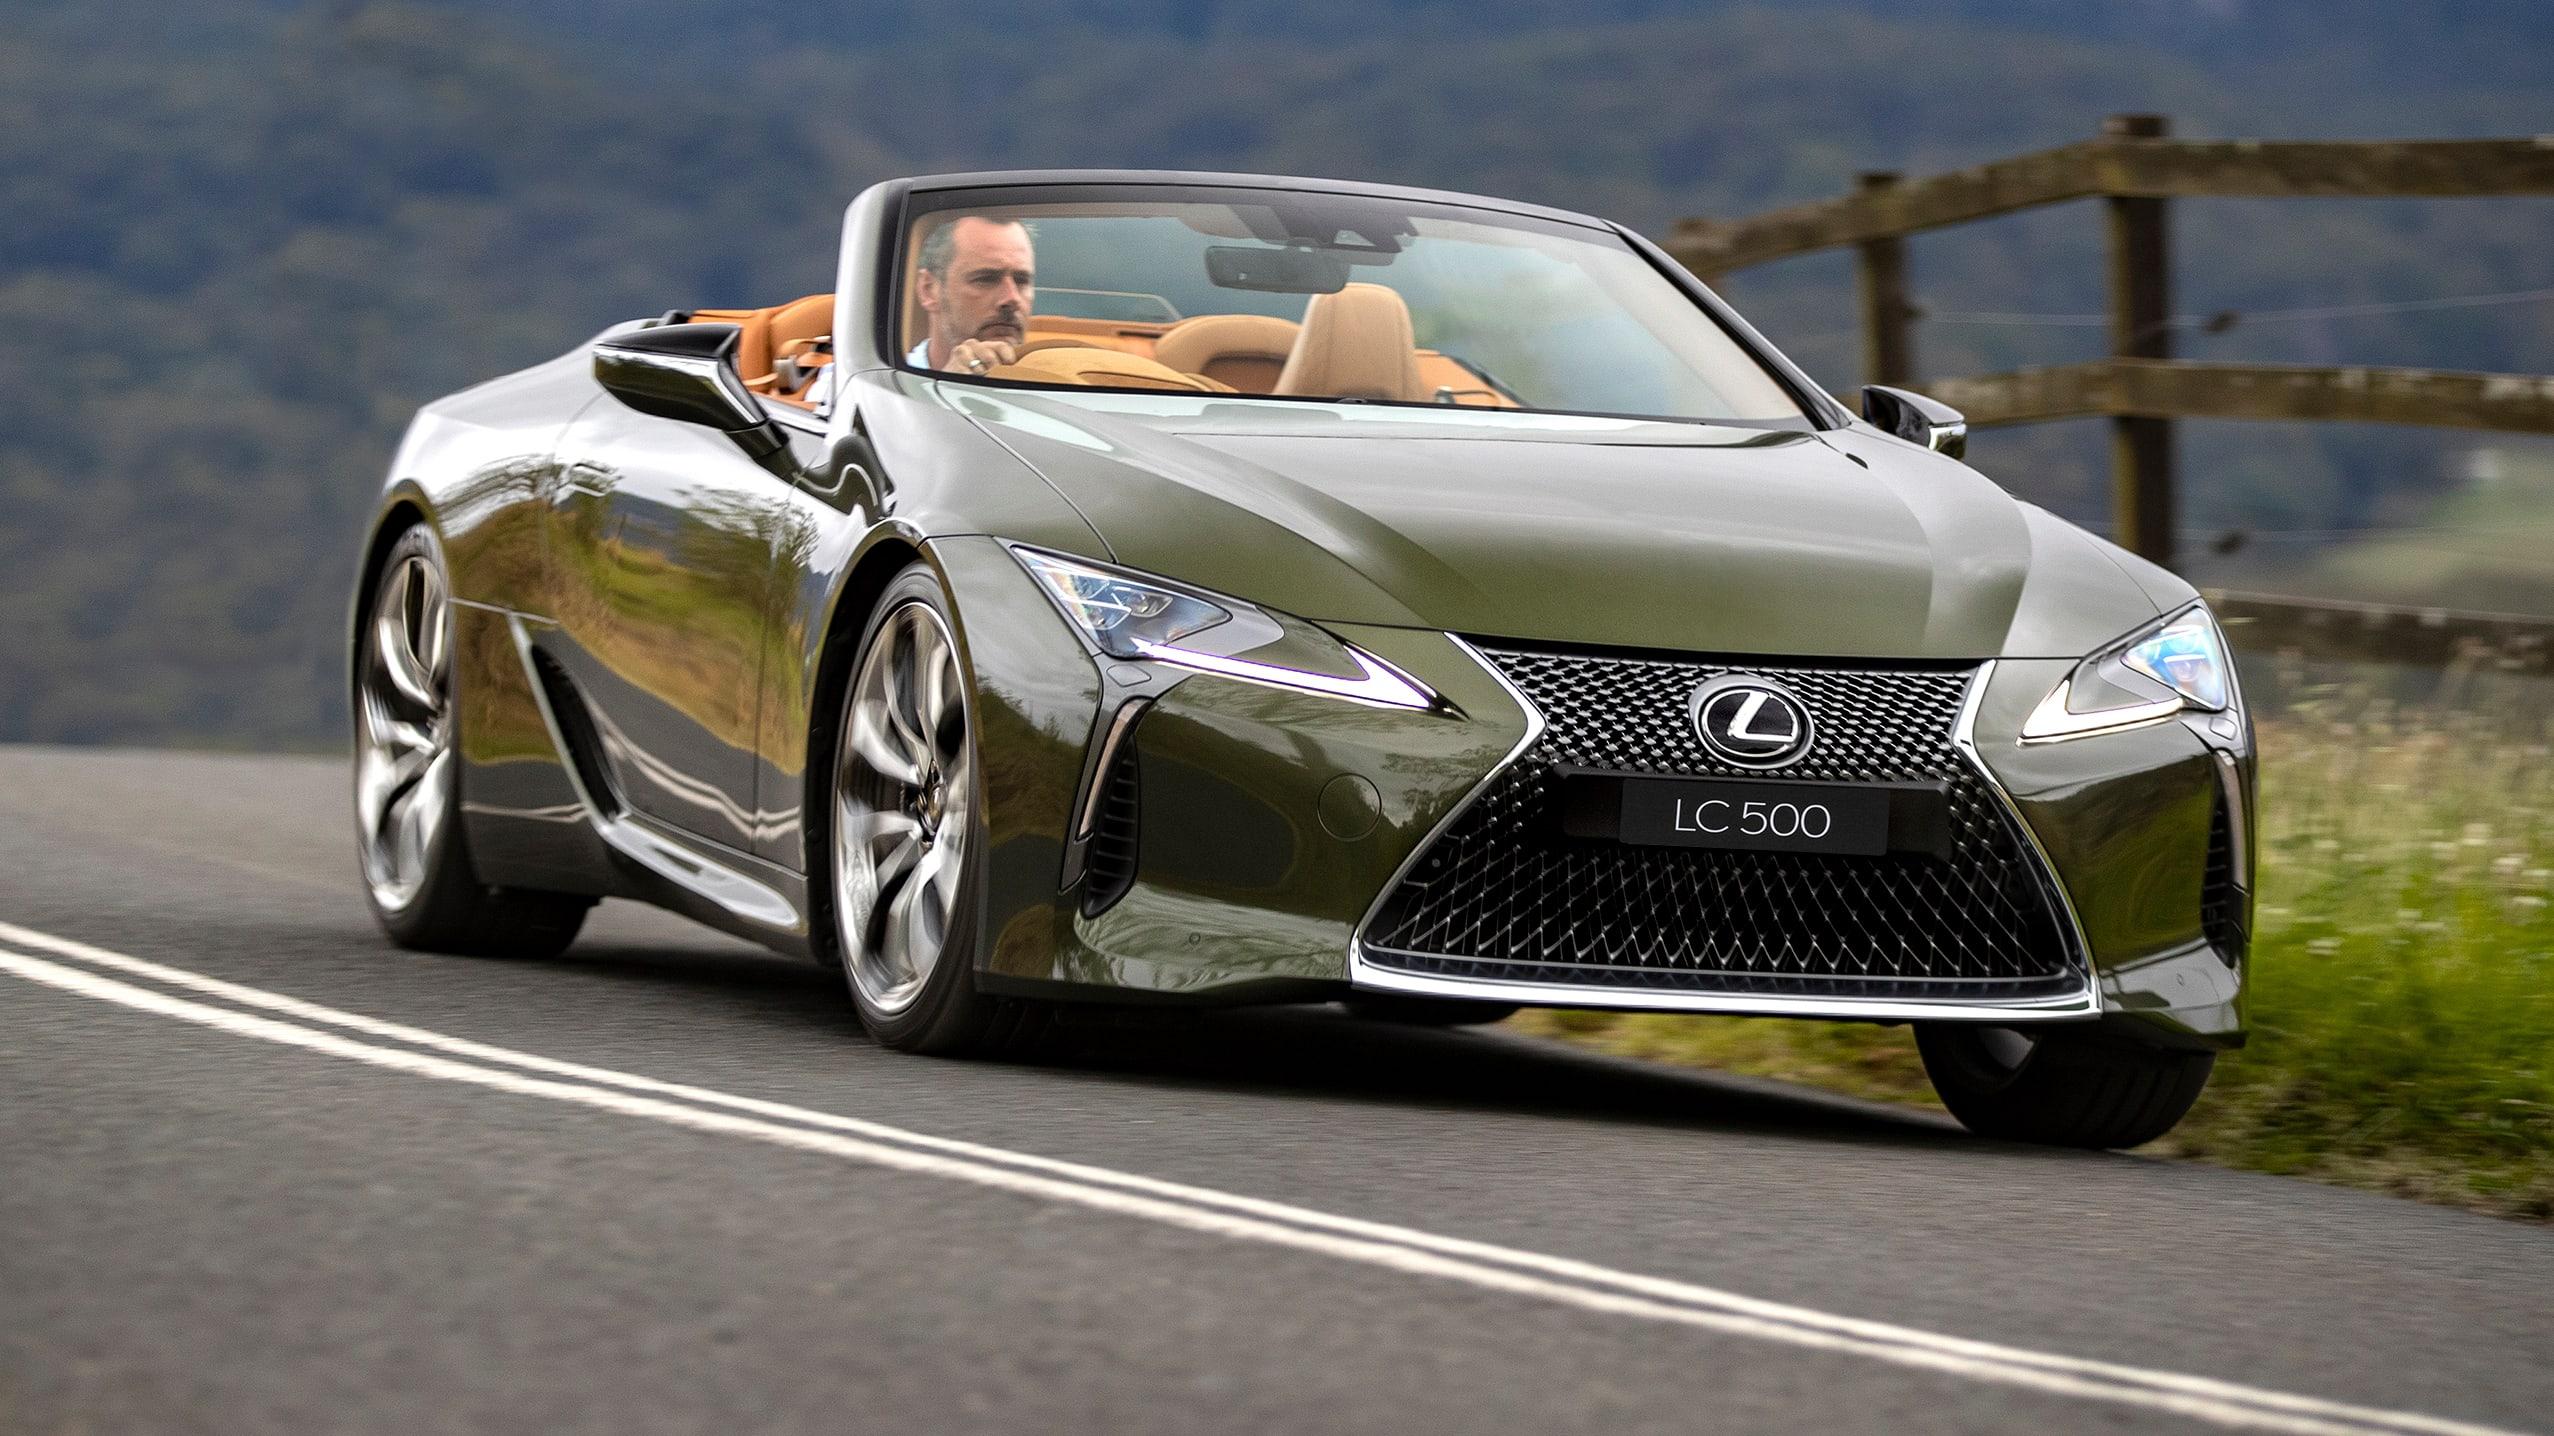 2021 Lexus Lc500 Convertible Price And Specs Update Australian Photos Caradvice